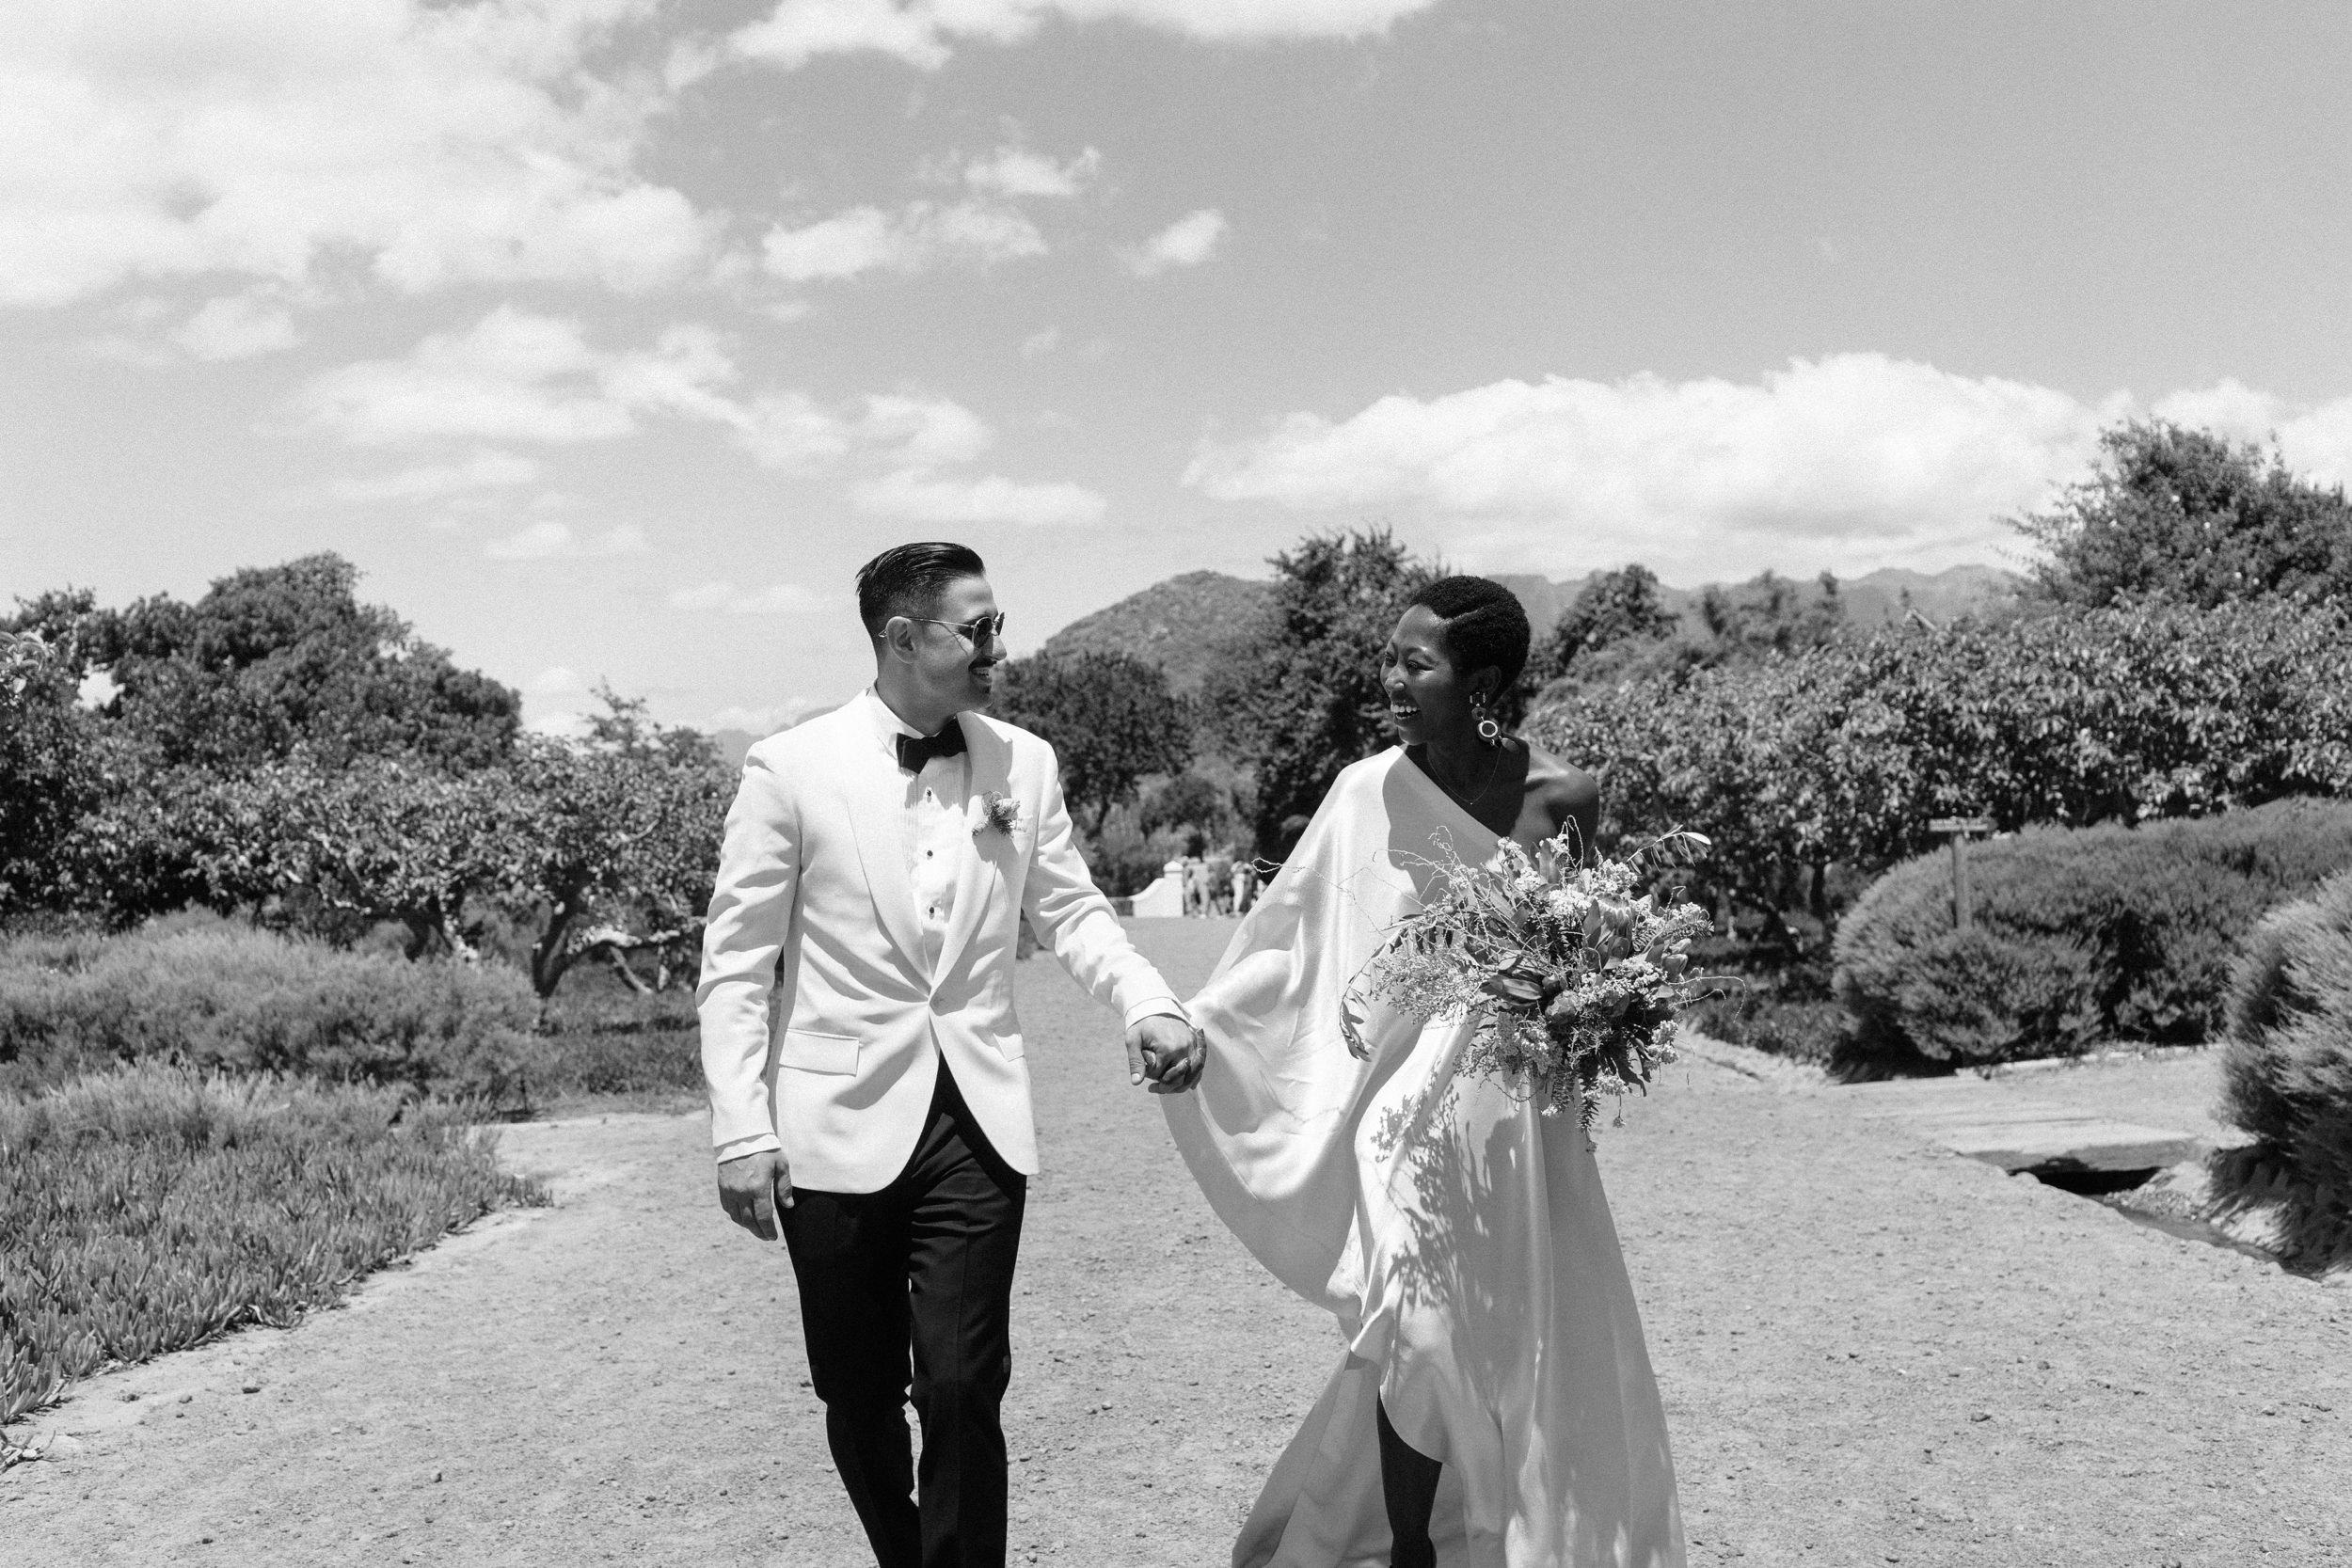 Marcus & Thando - An intimate wedding at Babylonstoren Farm